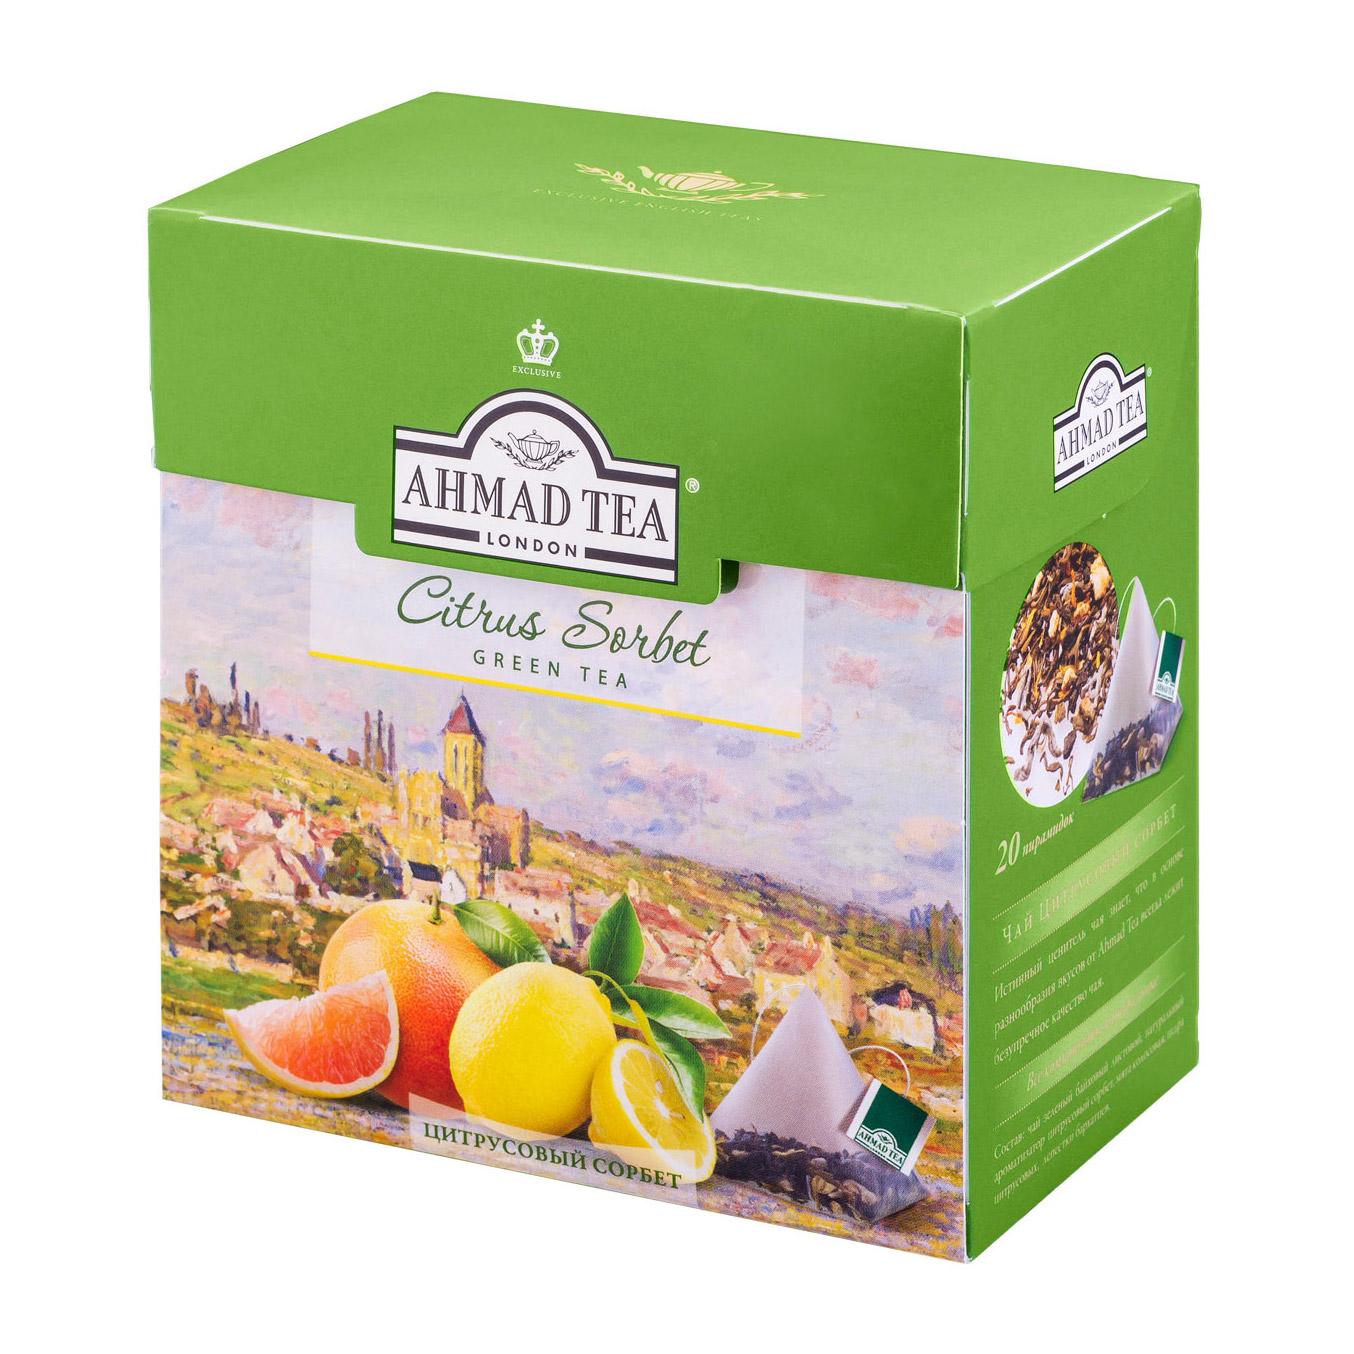 Чай Ahmad Tea Citrus Sorbet зеленый 20 пакетиков чай ahmad tea strawberry mousse зеленый 20 пакетиков